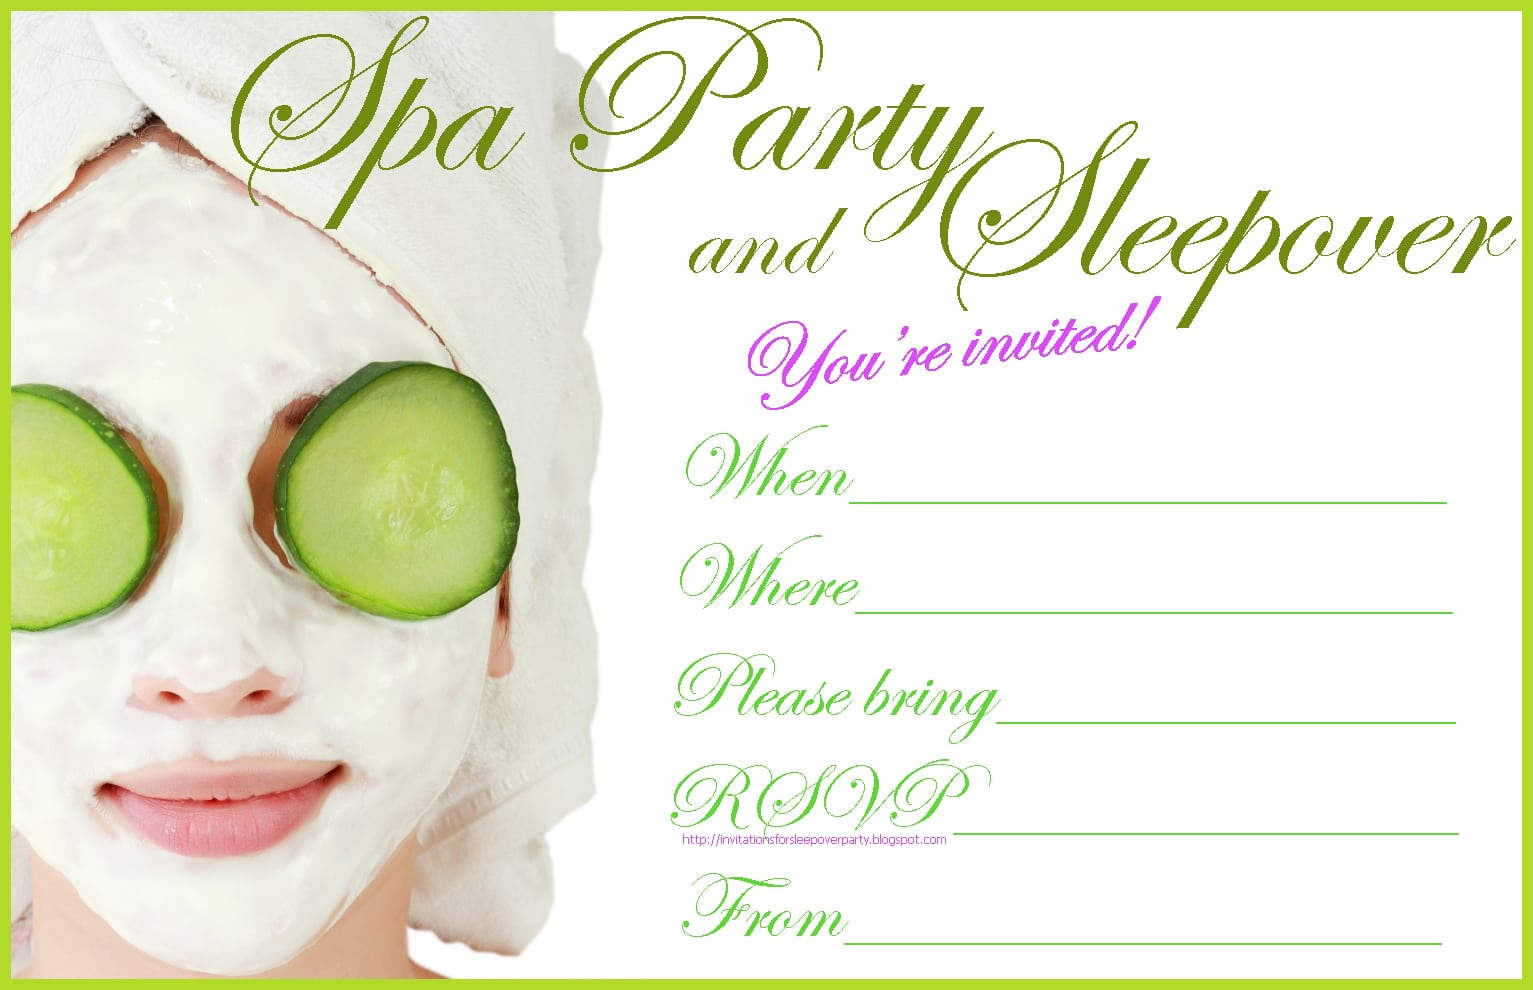 Free Spa Party Invitations Printable